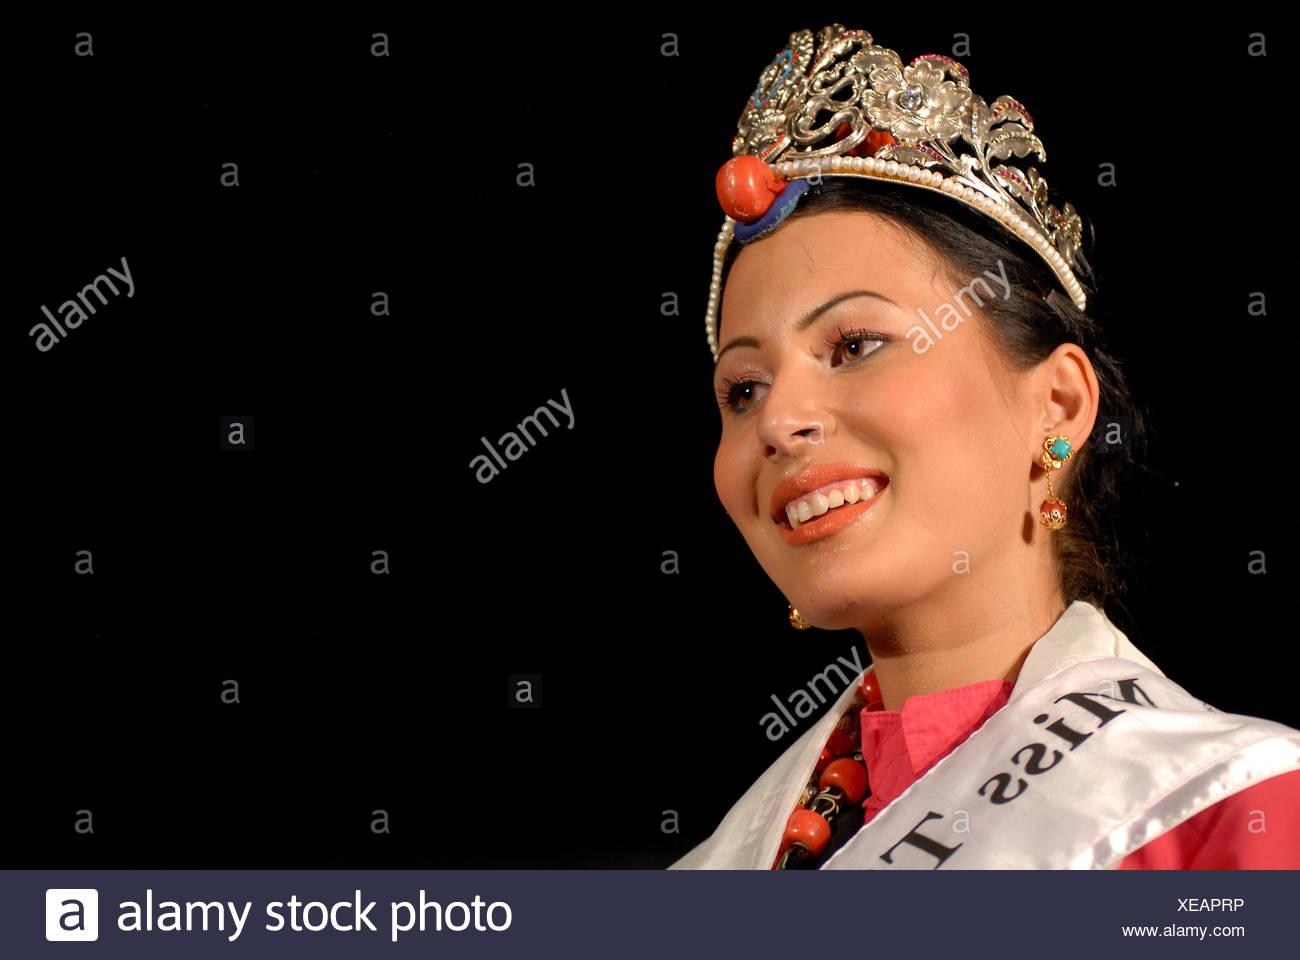 Winner of the Miss Tibet in Exile 2011 beauty contest, Tenzin Yangkyi in Dharamsala, McLeod Ganj, Himachal Pradesh, Himalayas - Stock Image